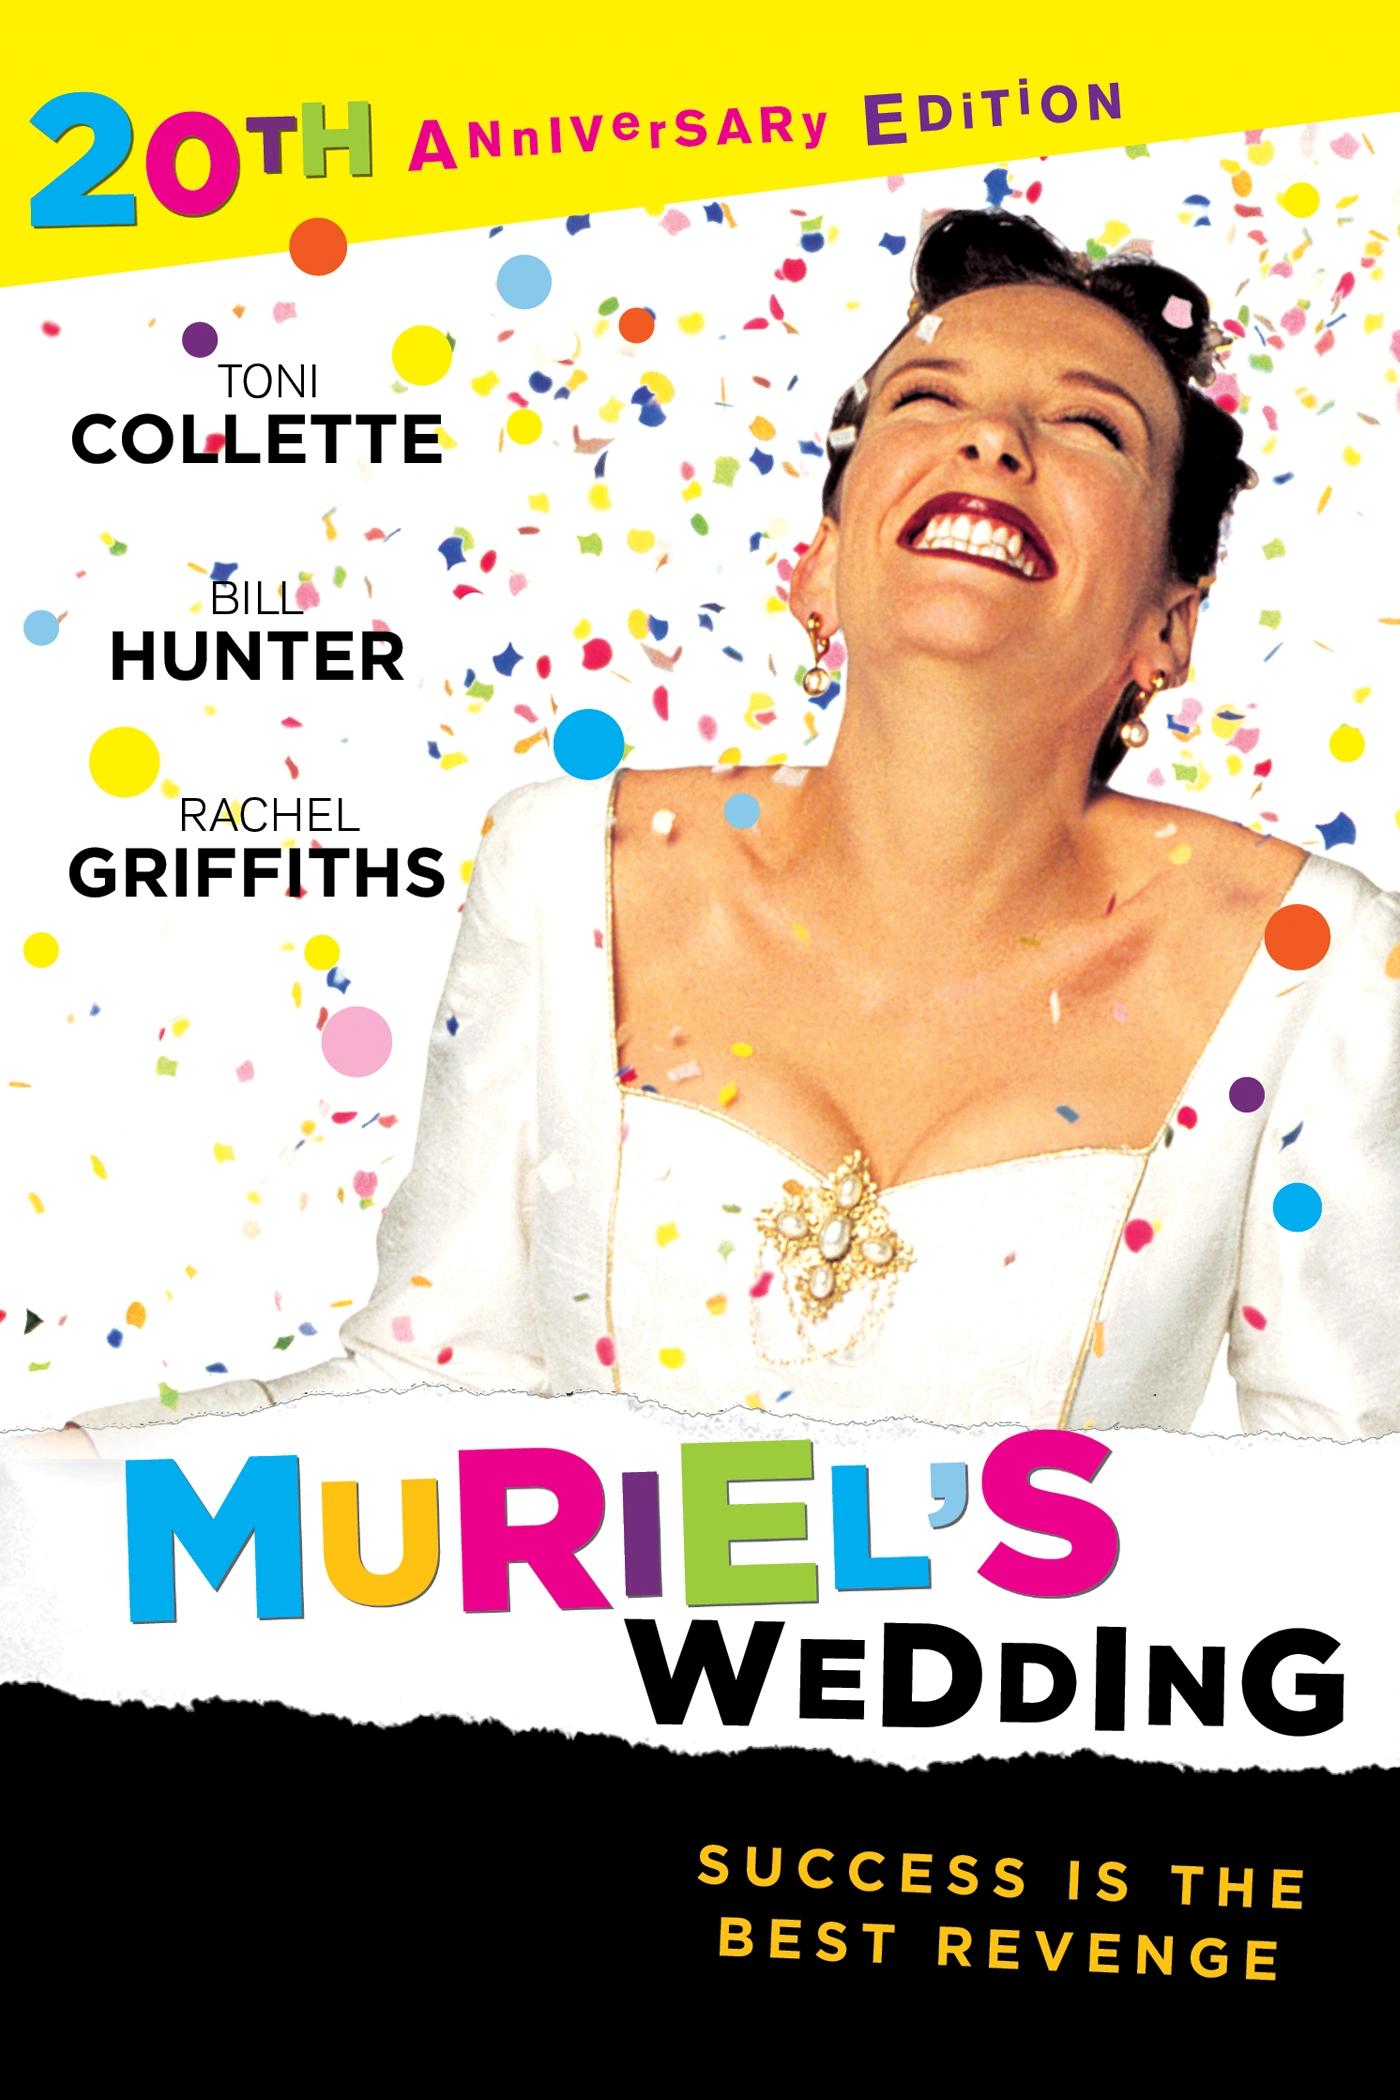 iTunes - Movies - Muriel's Wedding (20th Anniversary Edition)